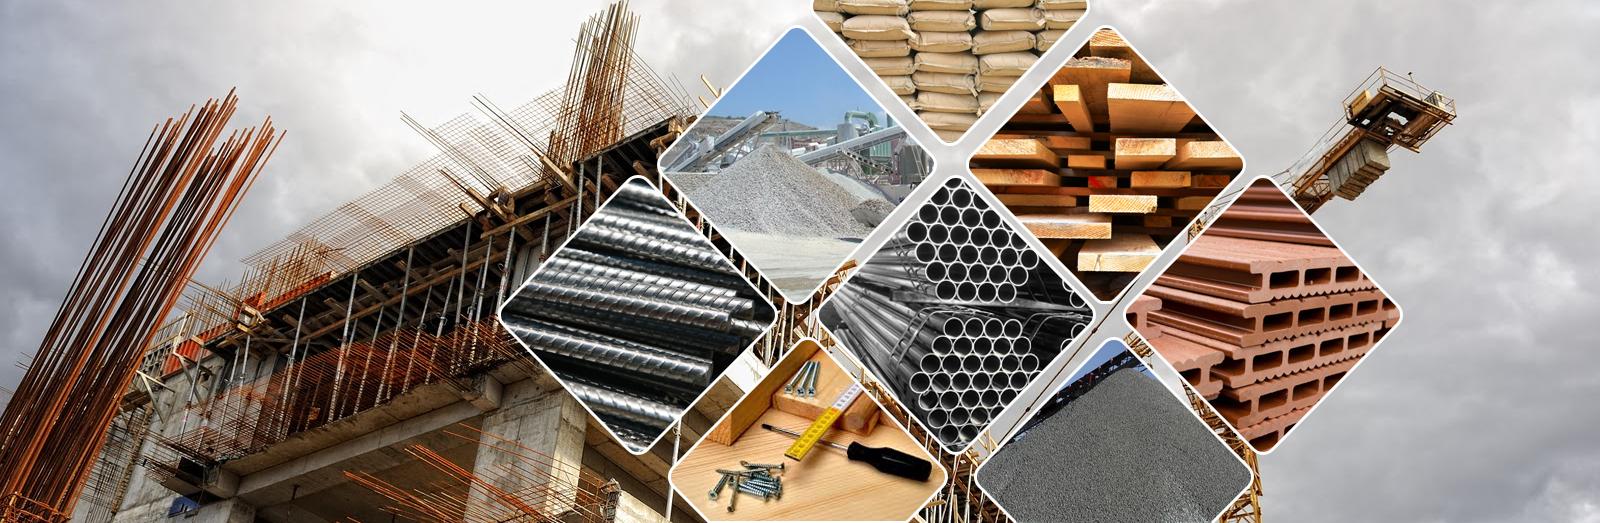 Constructii IDM Timisoara - Depozit Materiale de Constructii